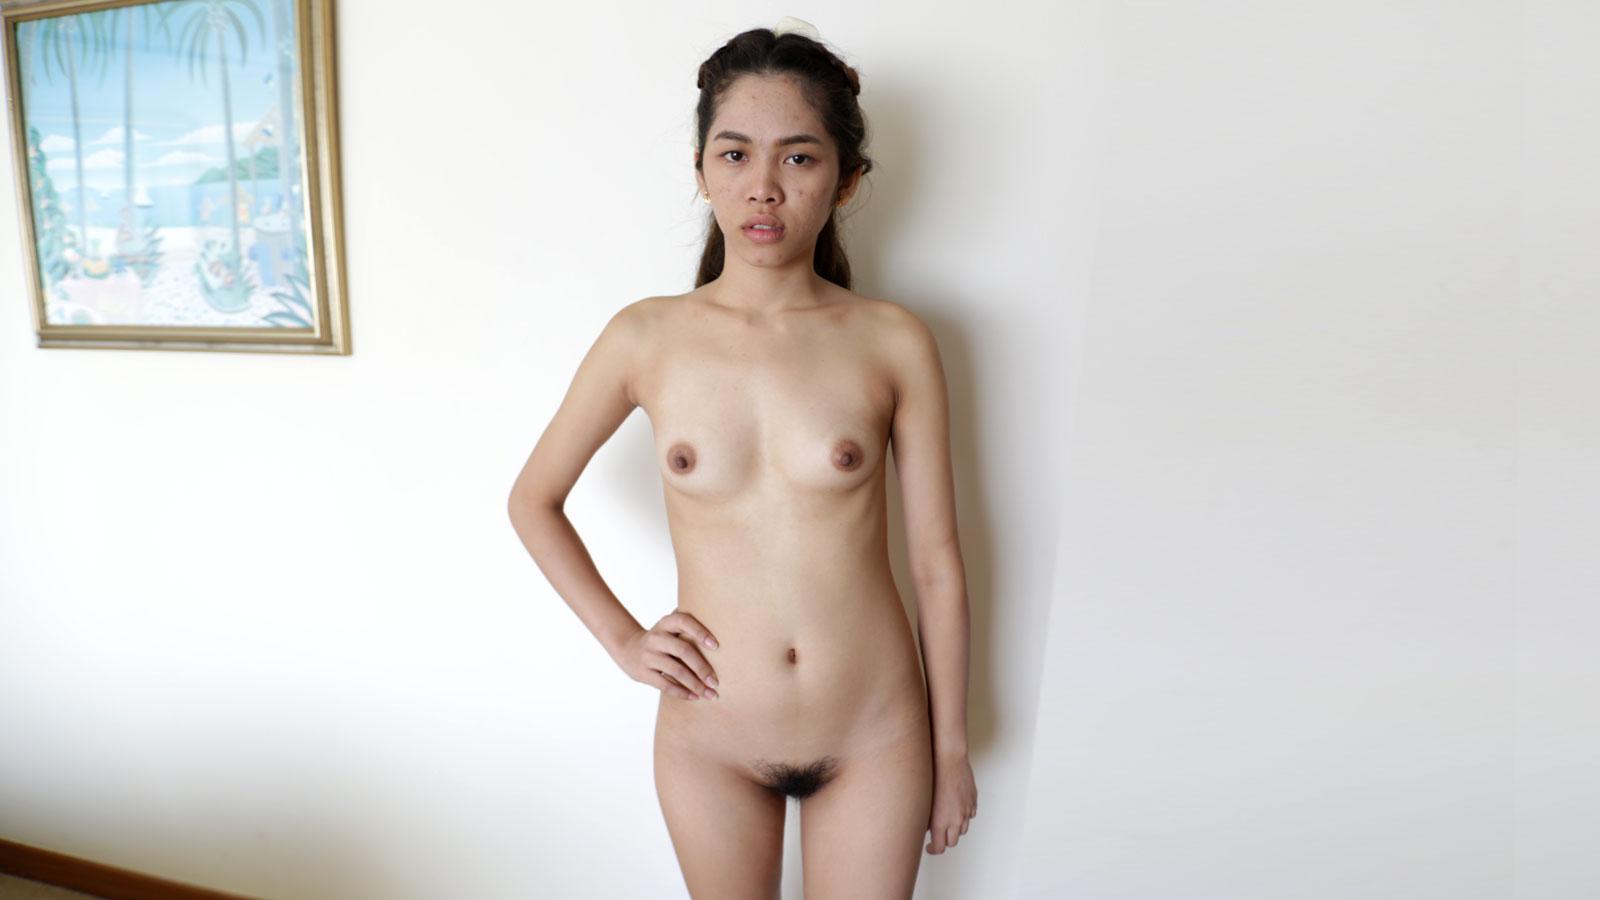 SKINNY ASIAN TEEN PORN Pics on FapSuey.com